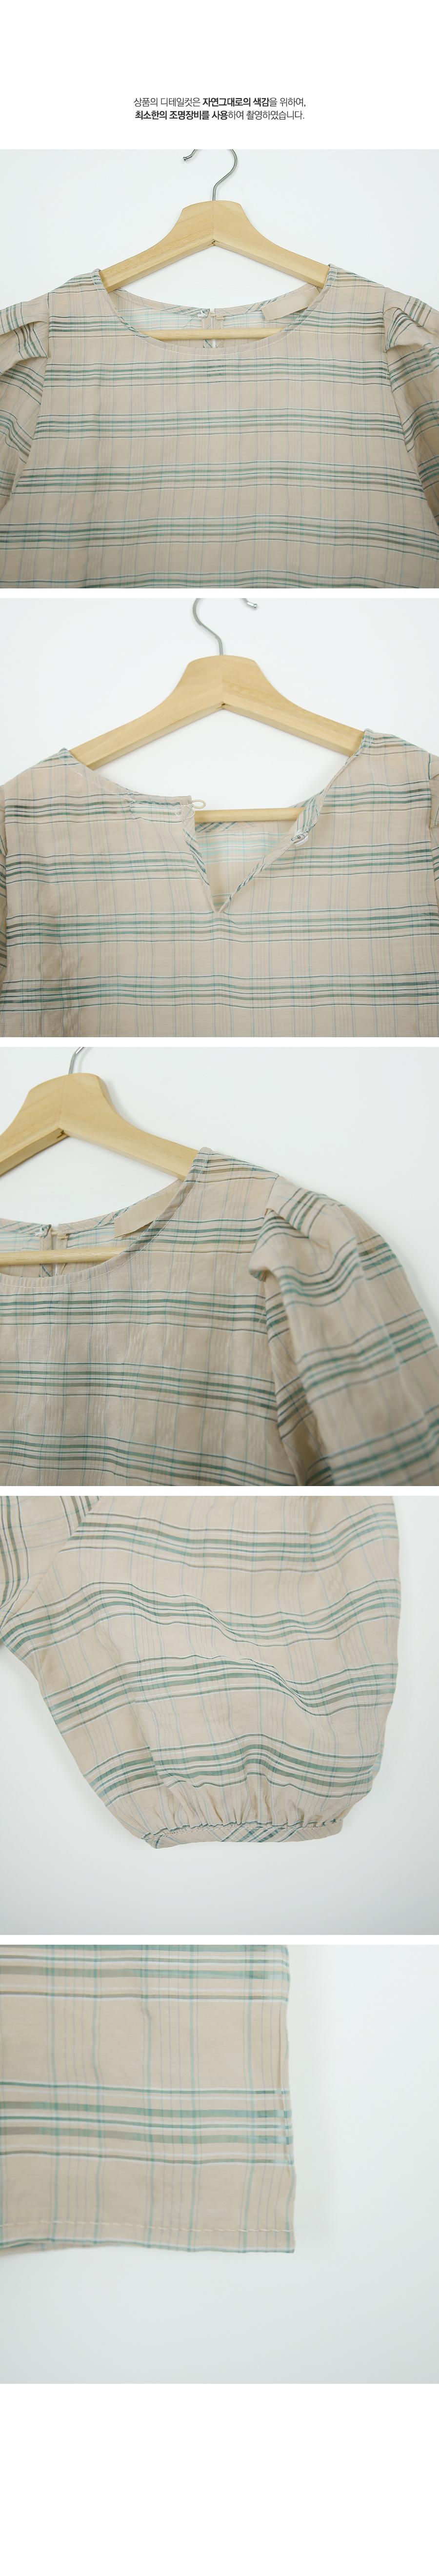 Sarkis check puff blouse